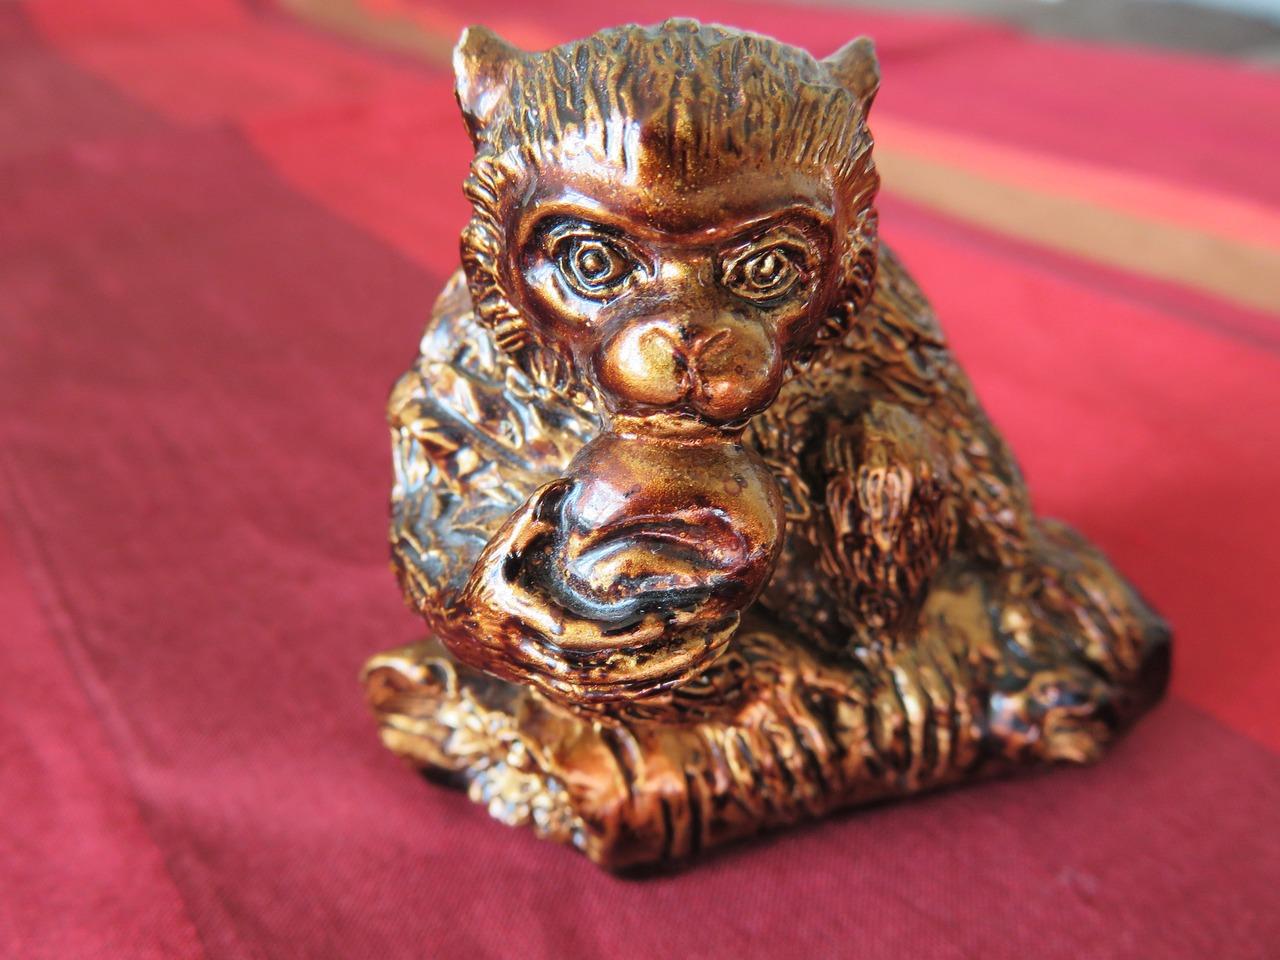 maimuta de foc - sfatulparintilor.ro - pixabay_com